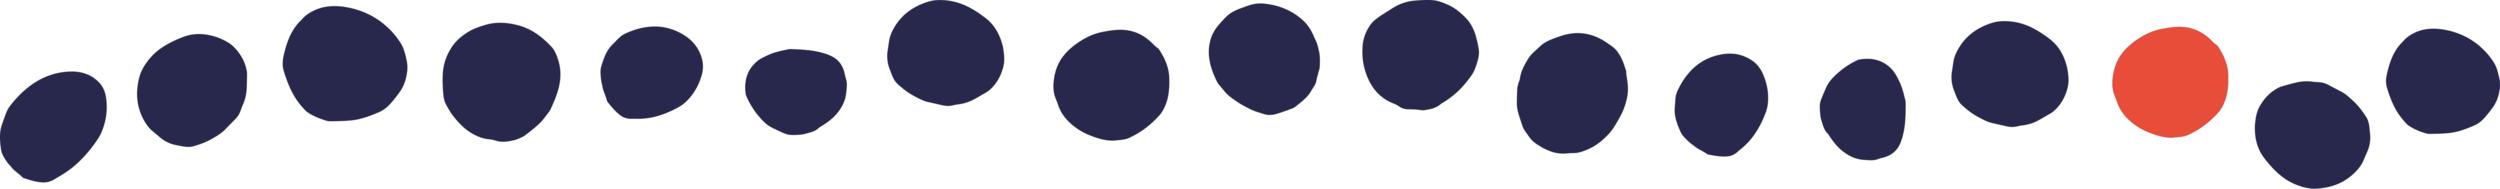 spots-longer.jpg